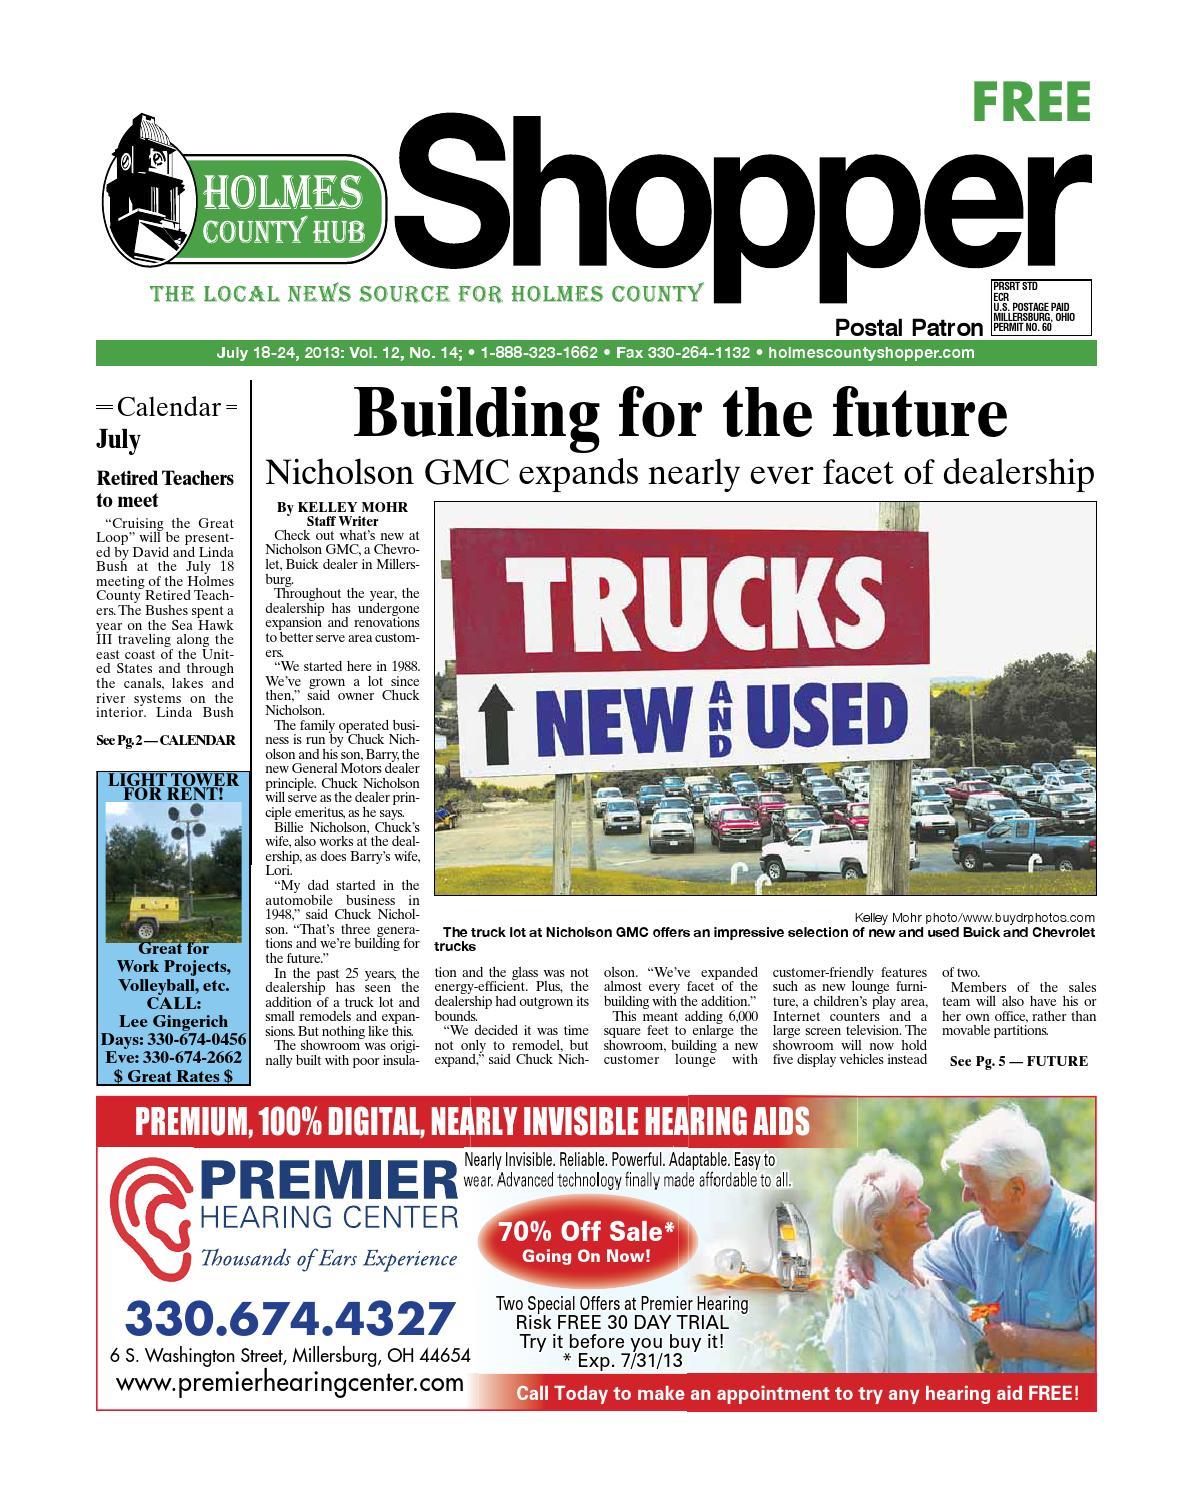 Holmes county hub shopper july 18 2013 by gatehouse media neo issuu fandeluxe Gallery